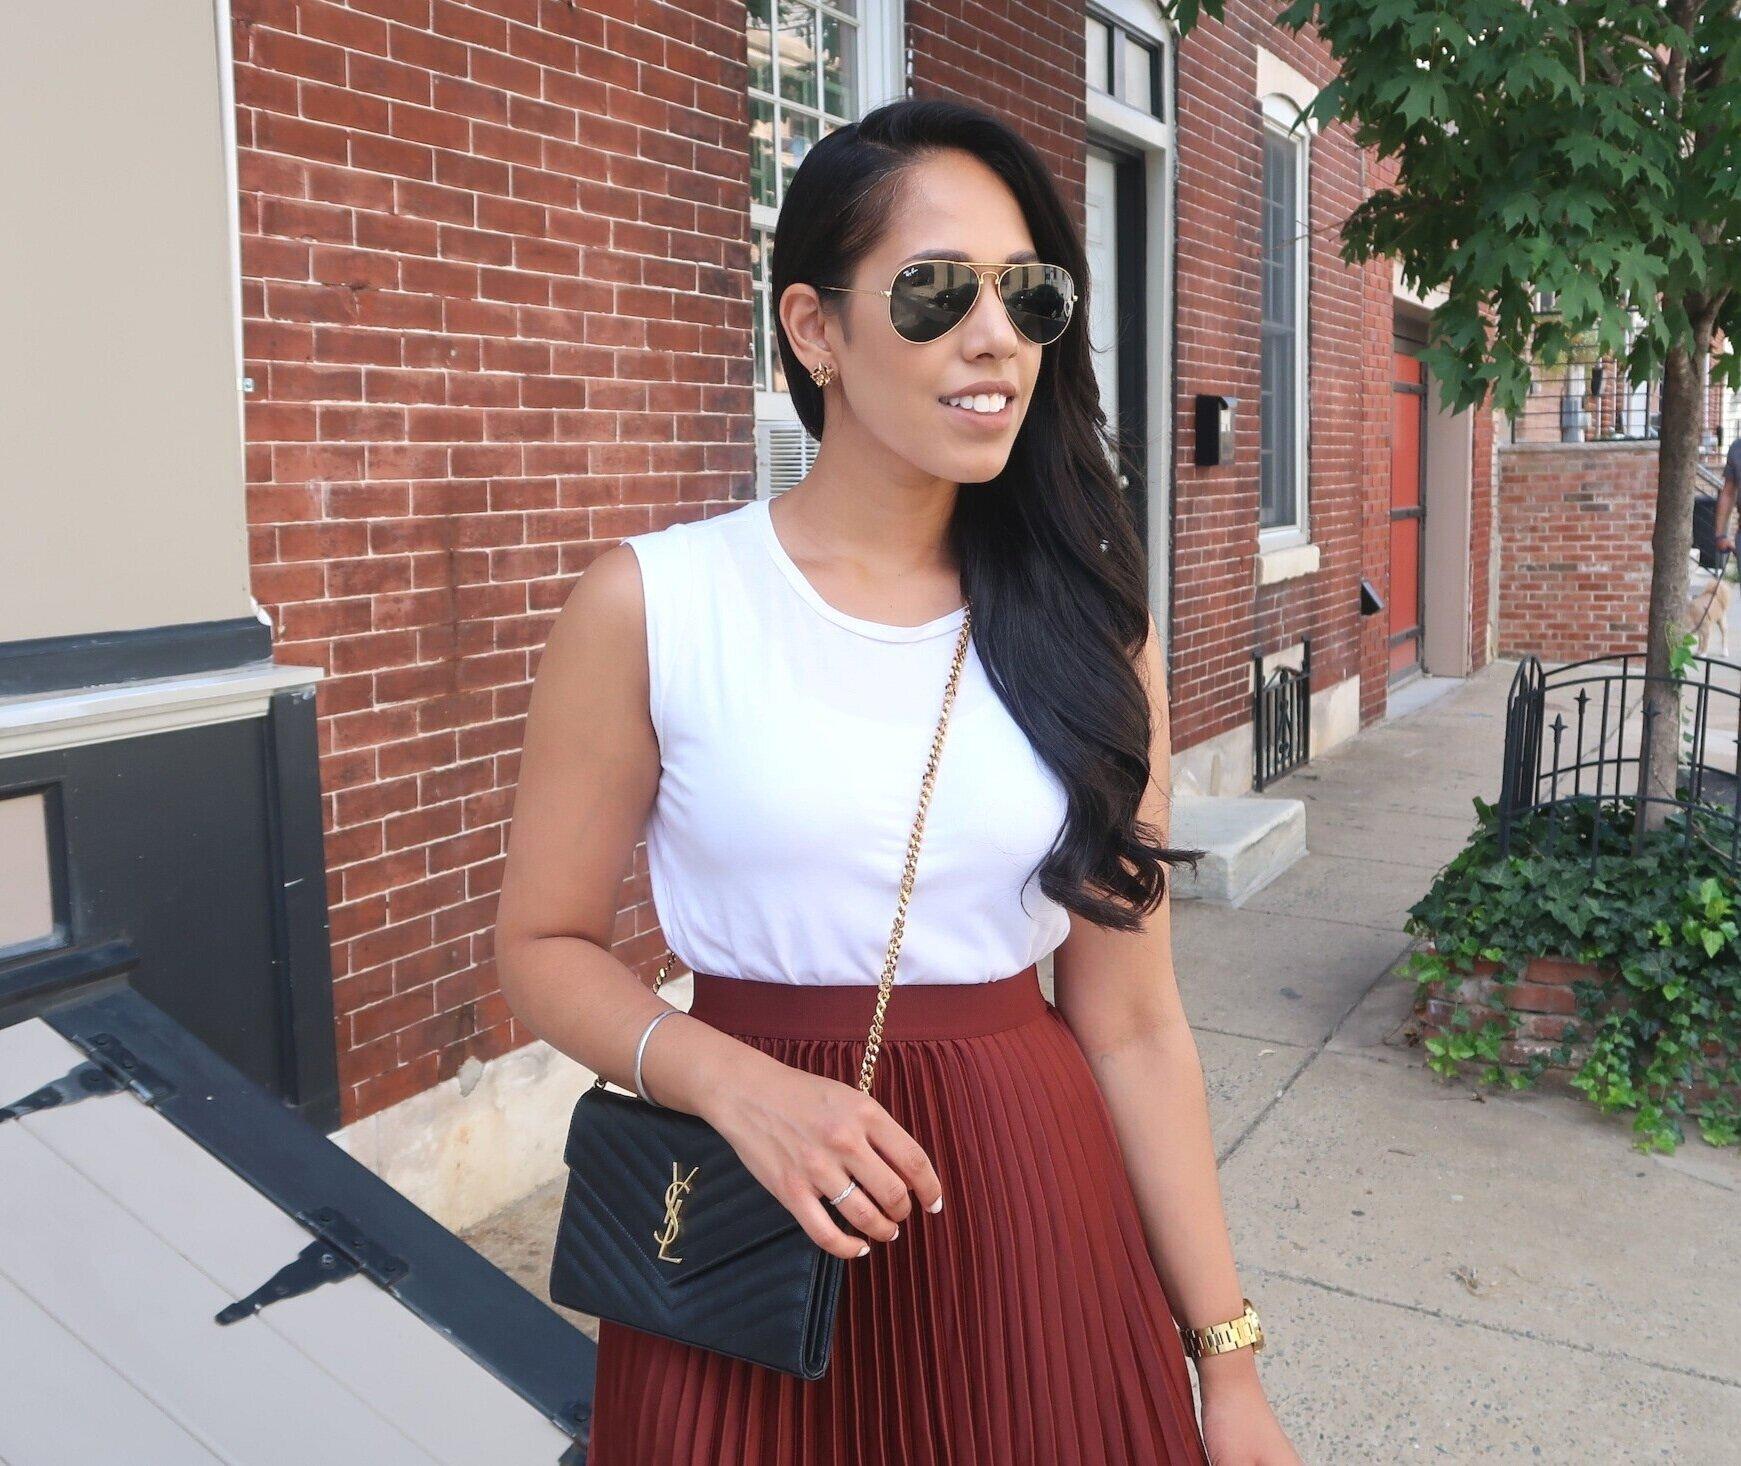 pleated-skirt-fall-outfit-inspiration-philadelphia.JPG